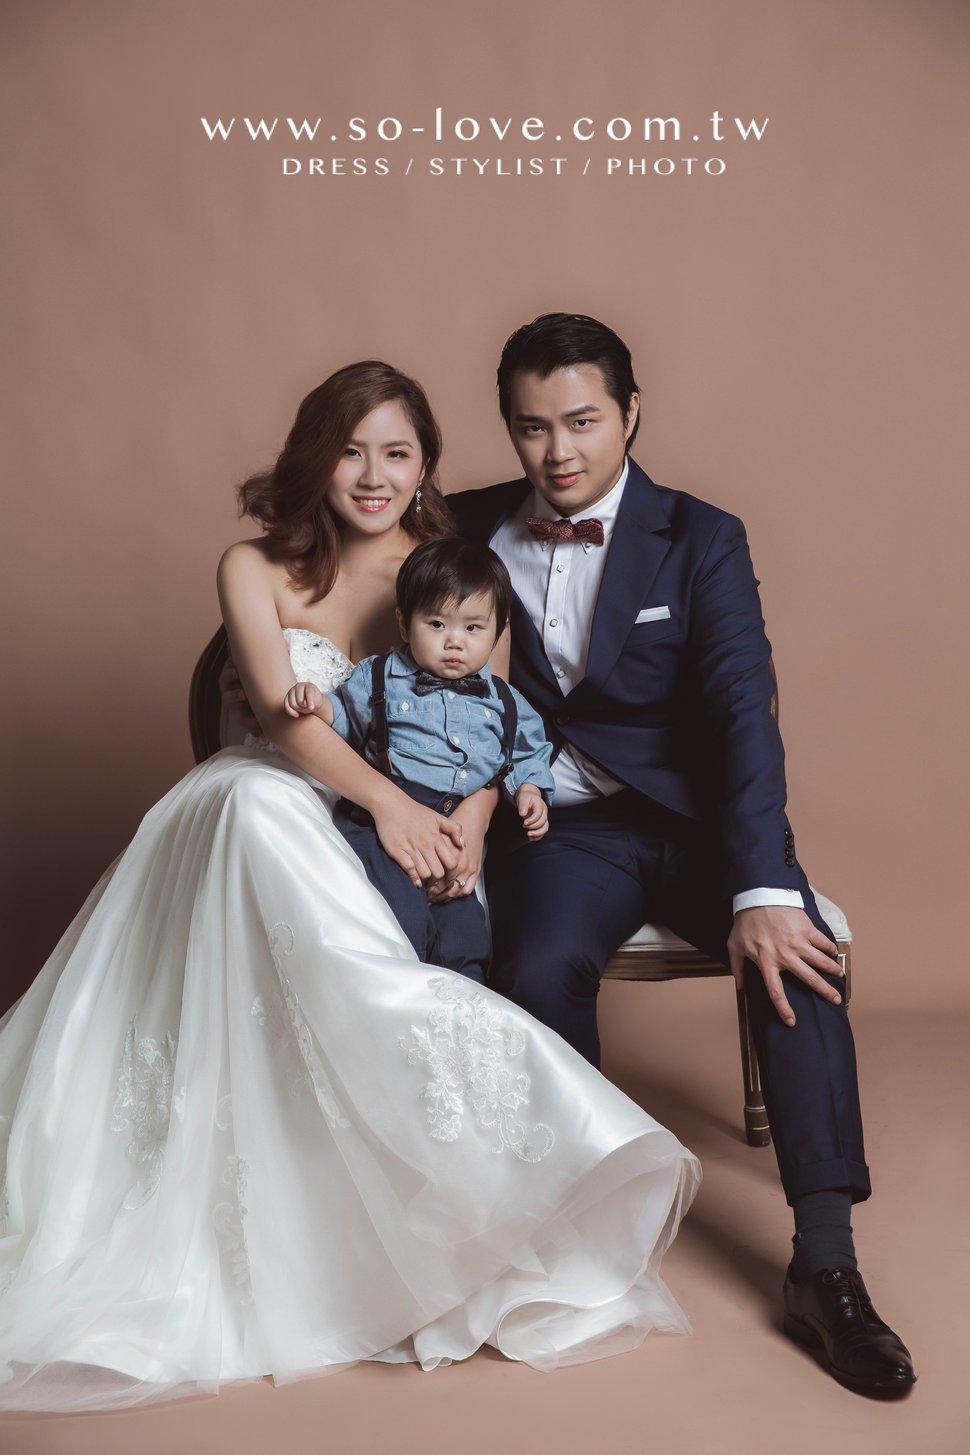 YCG2B8259 - So.Love Wedding 樂樂蕾絲《結婚吧》